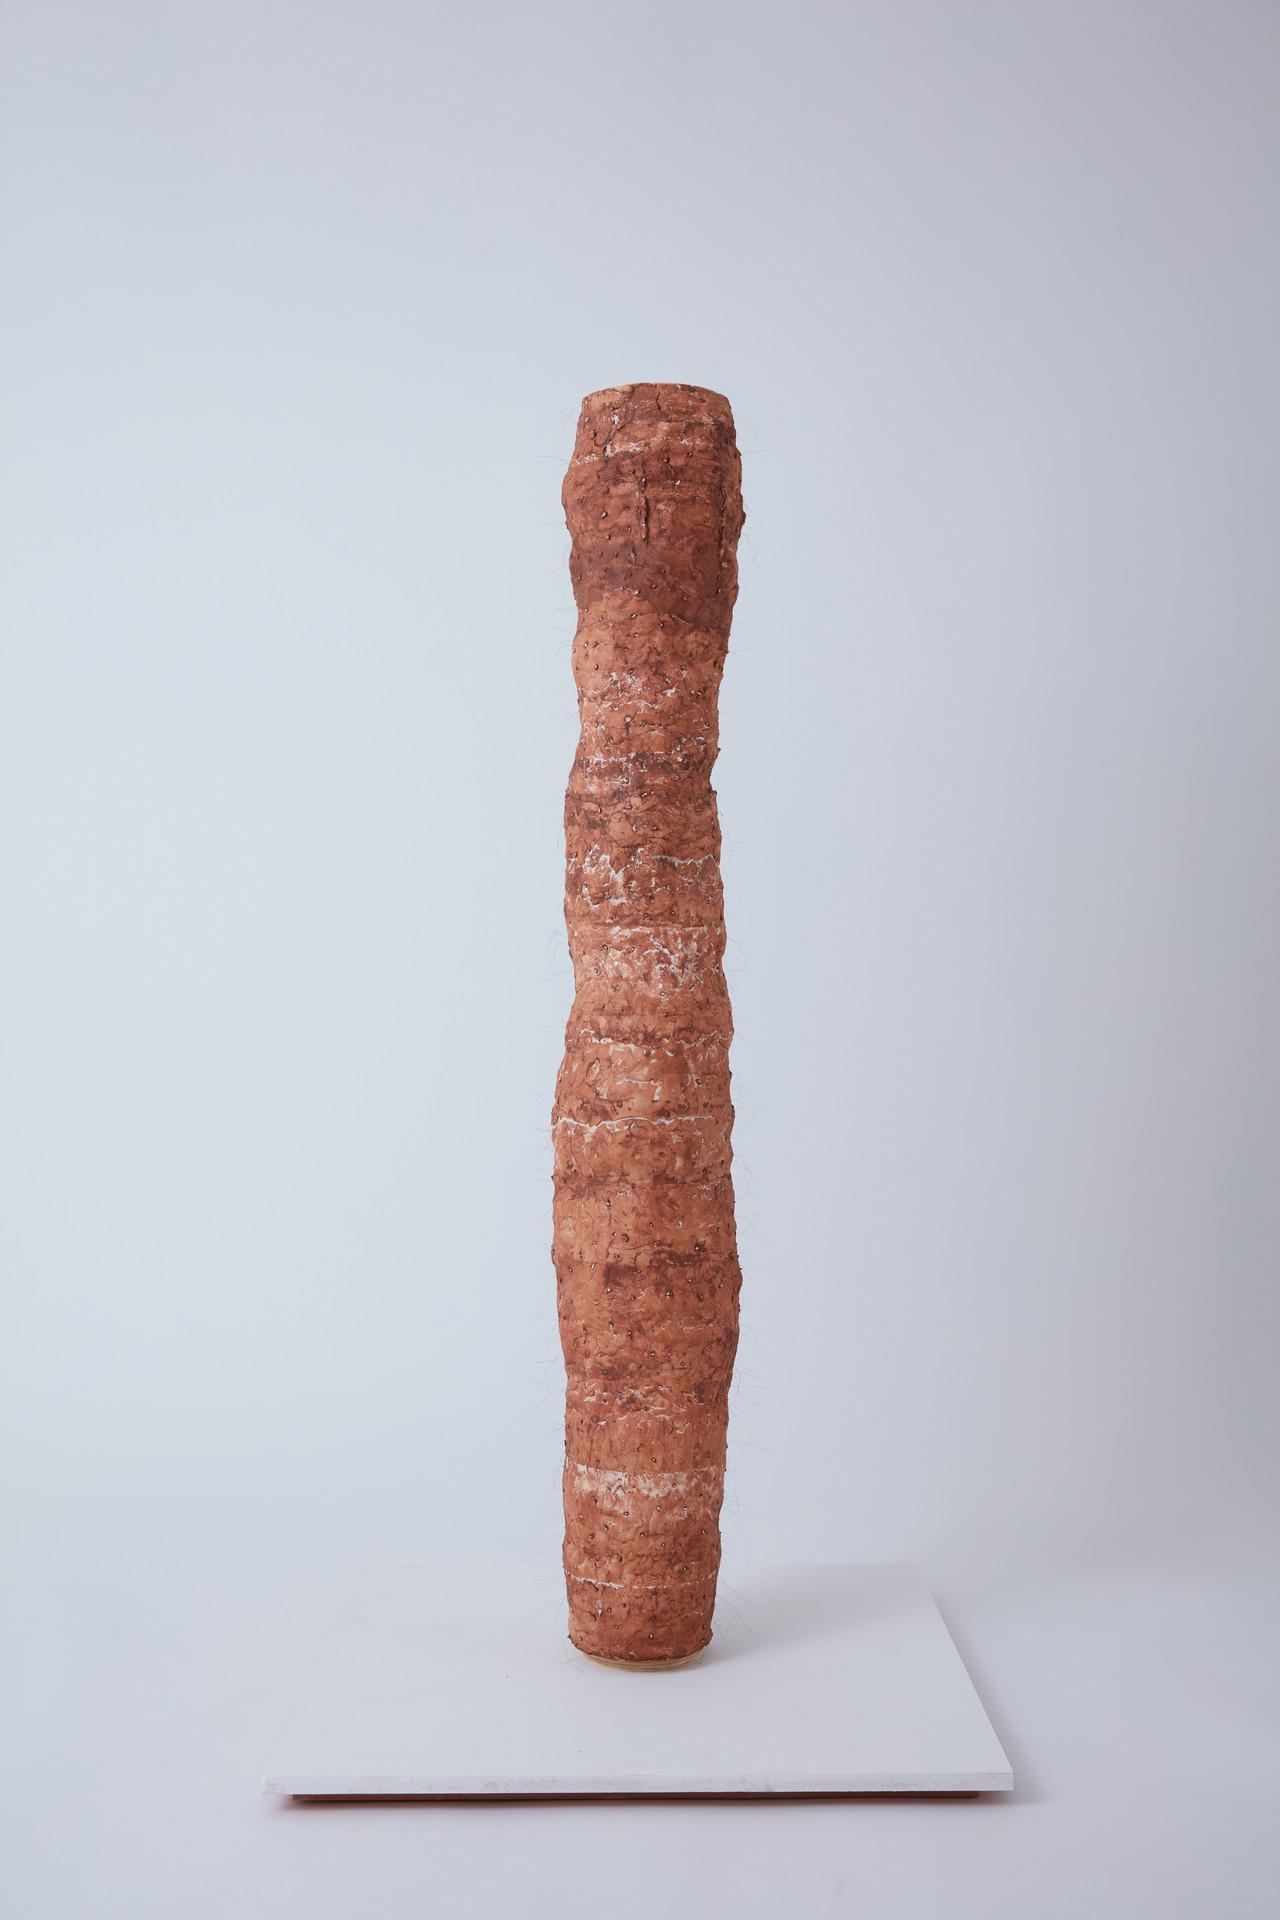 Human Fur, 2019 (plaster, clay, fake hair, MDF board, metal rod)